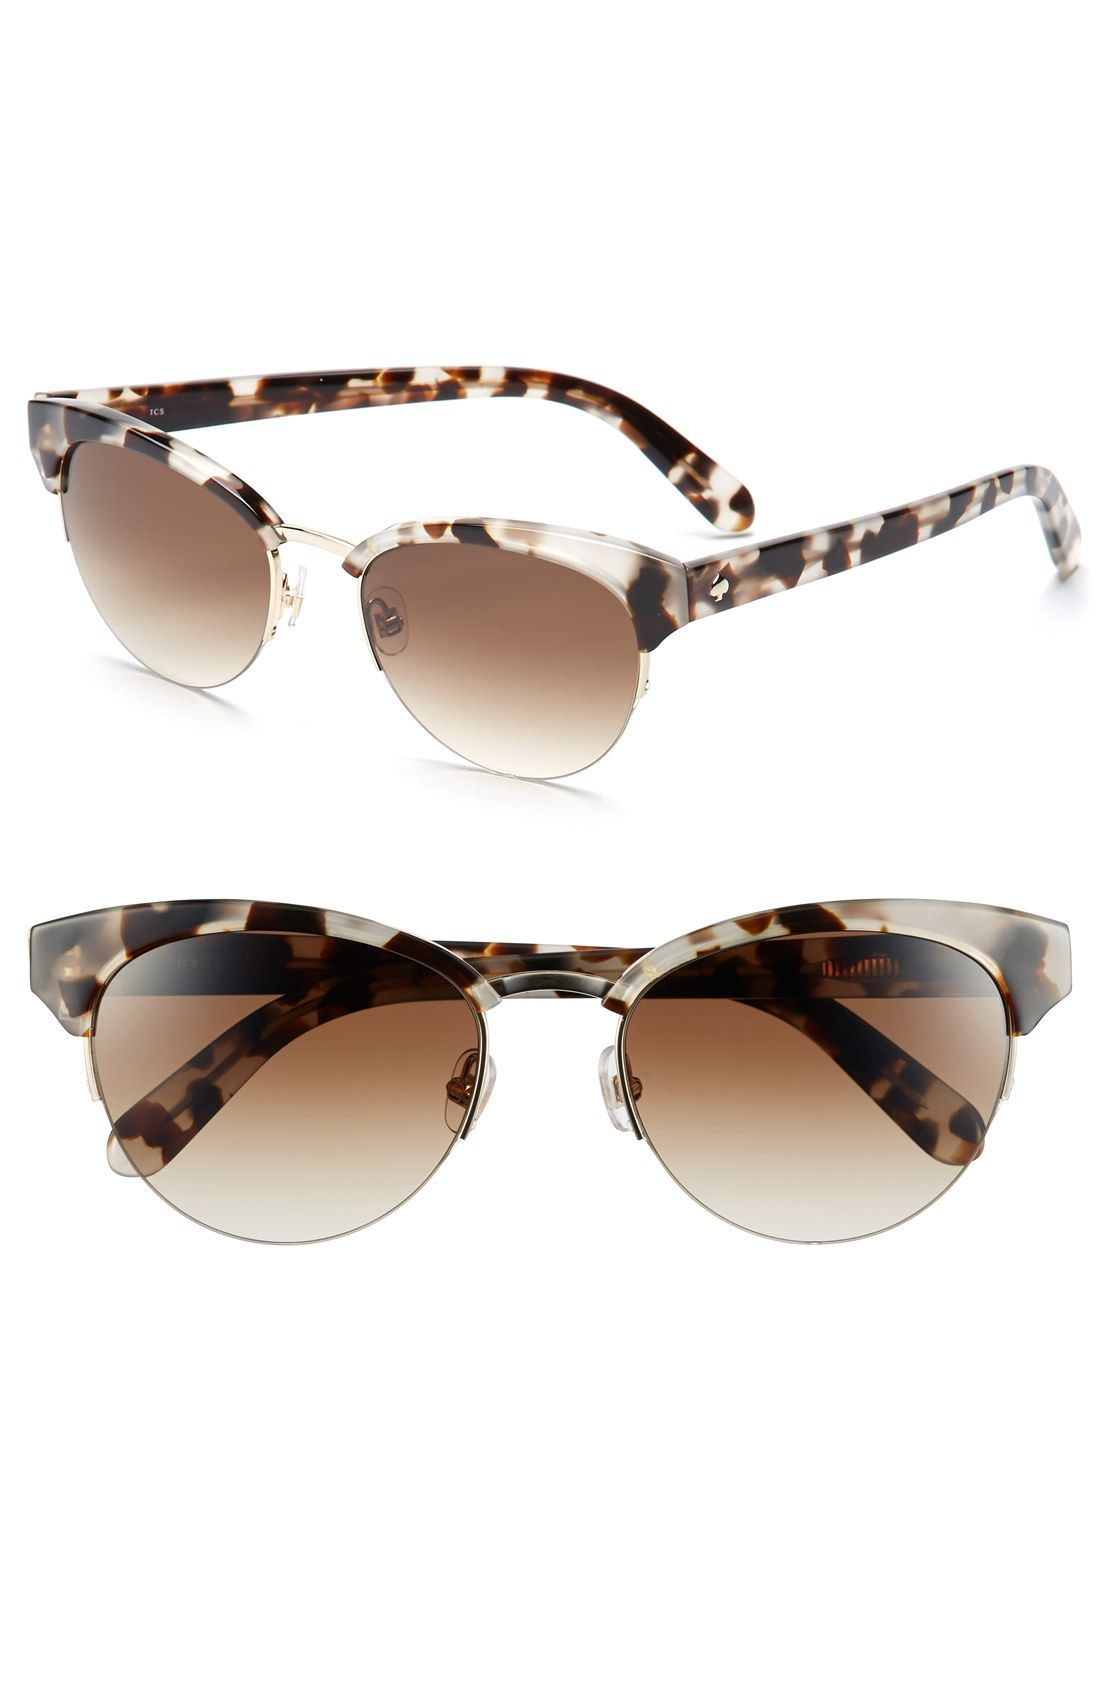 Classy Kate Spade cat eye sunglasses in speckled tortoise